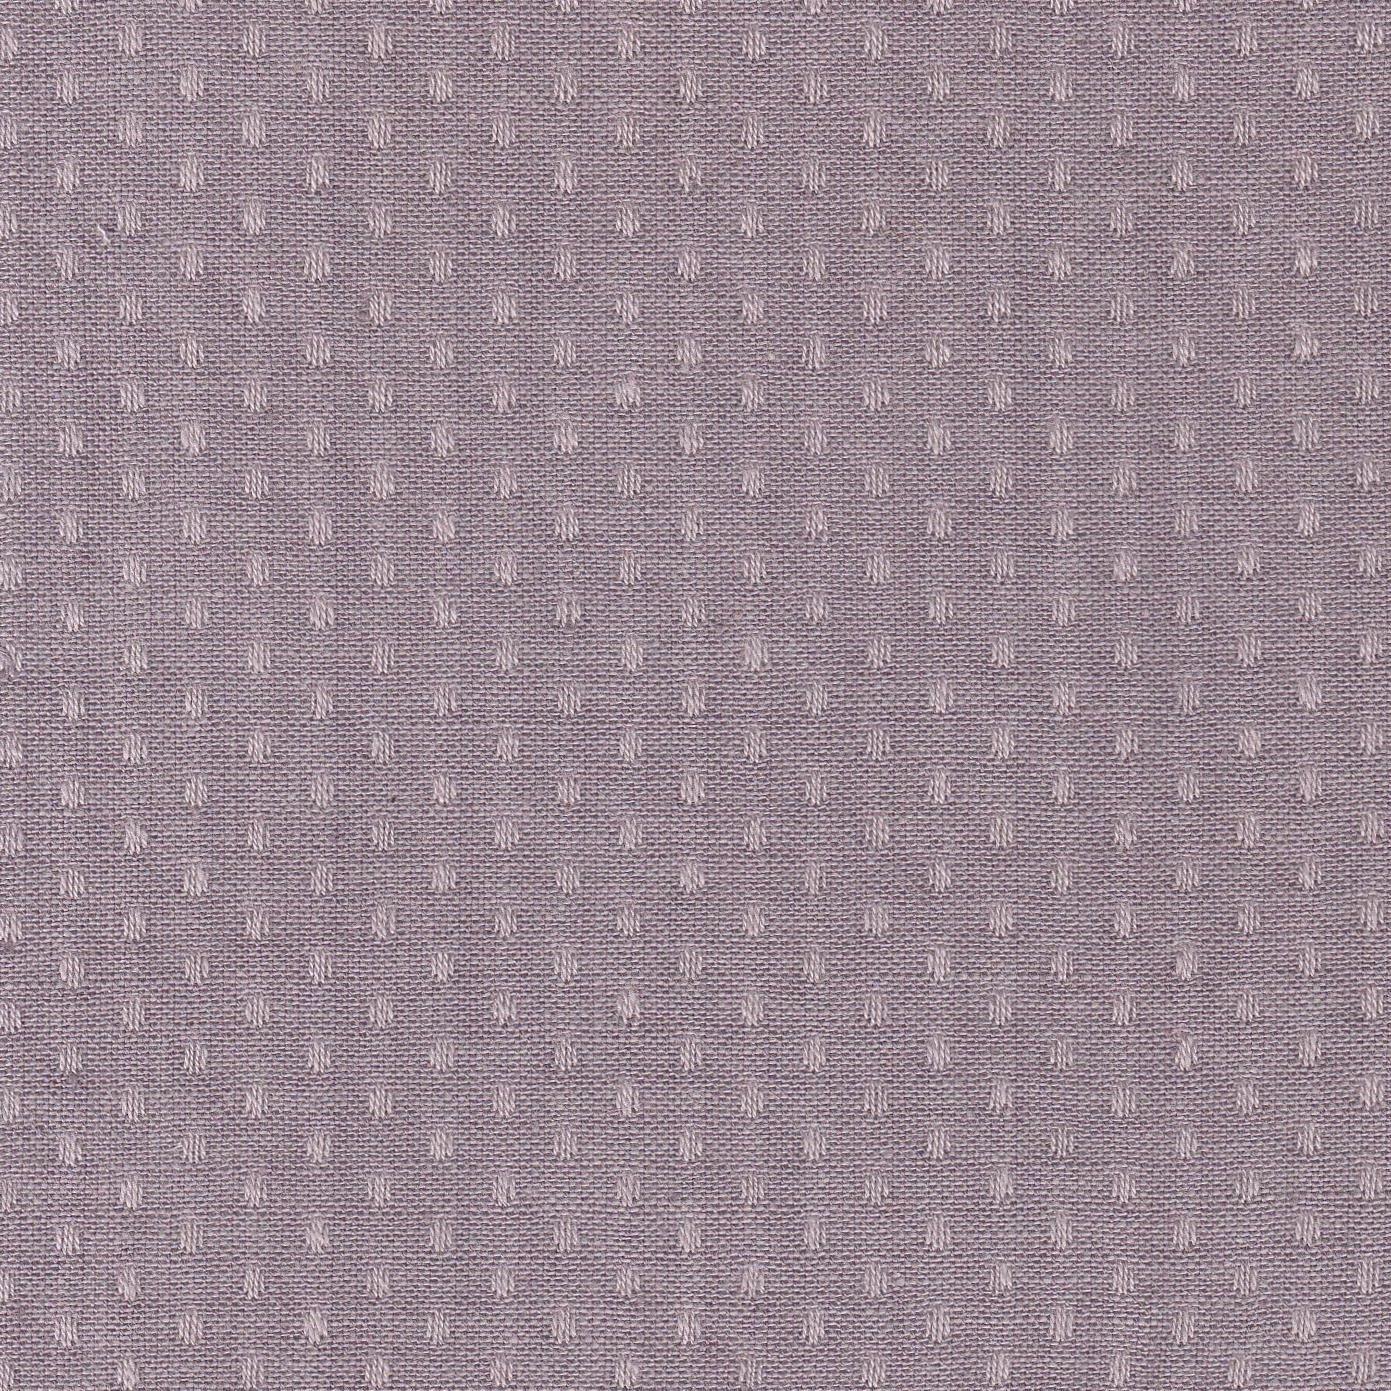 Diamond Textiles Manchester - Pluses and Crosses (Light Plum)